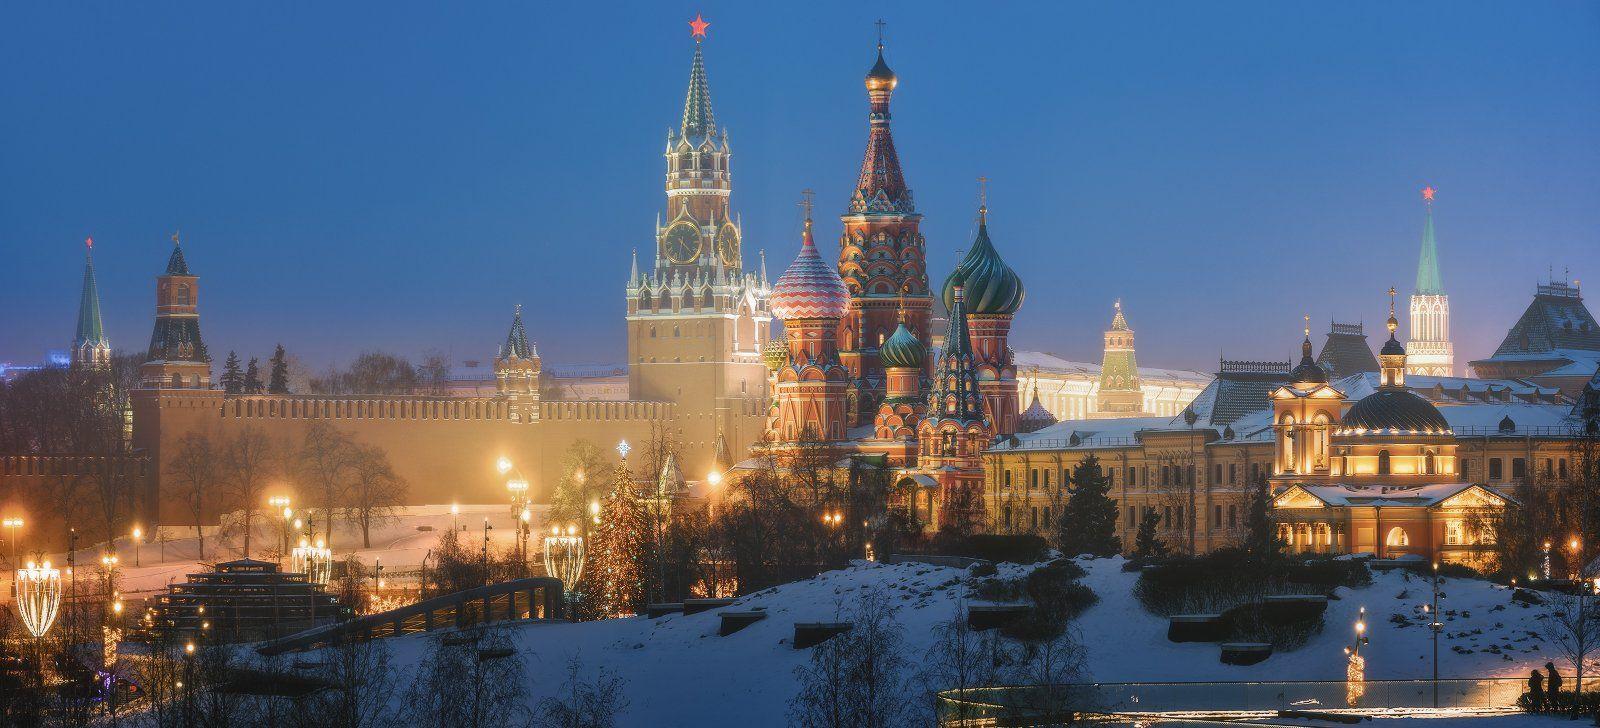 москва, зарядье, кремль, Ilya Melikhov